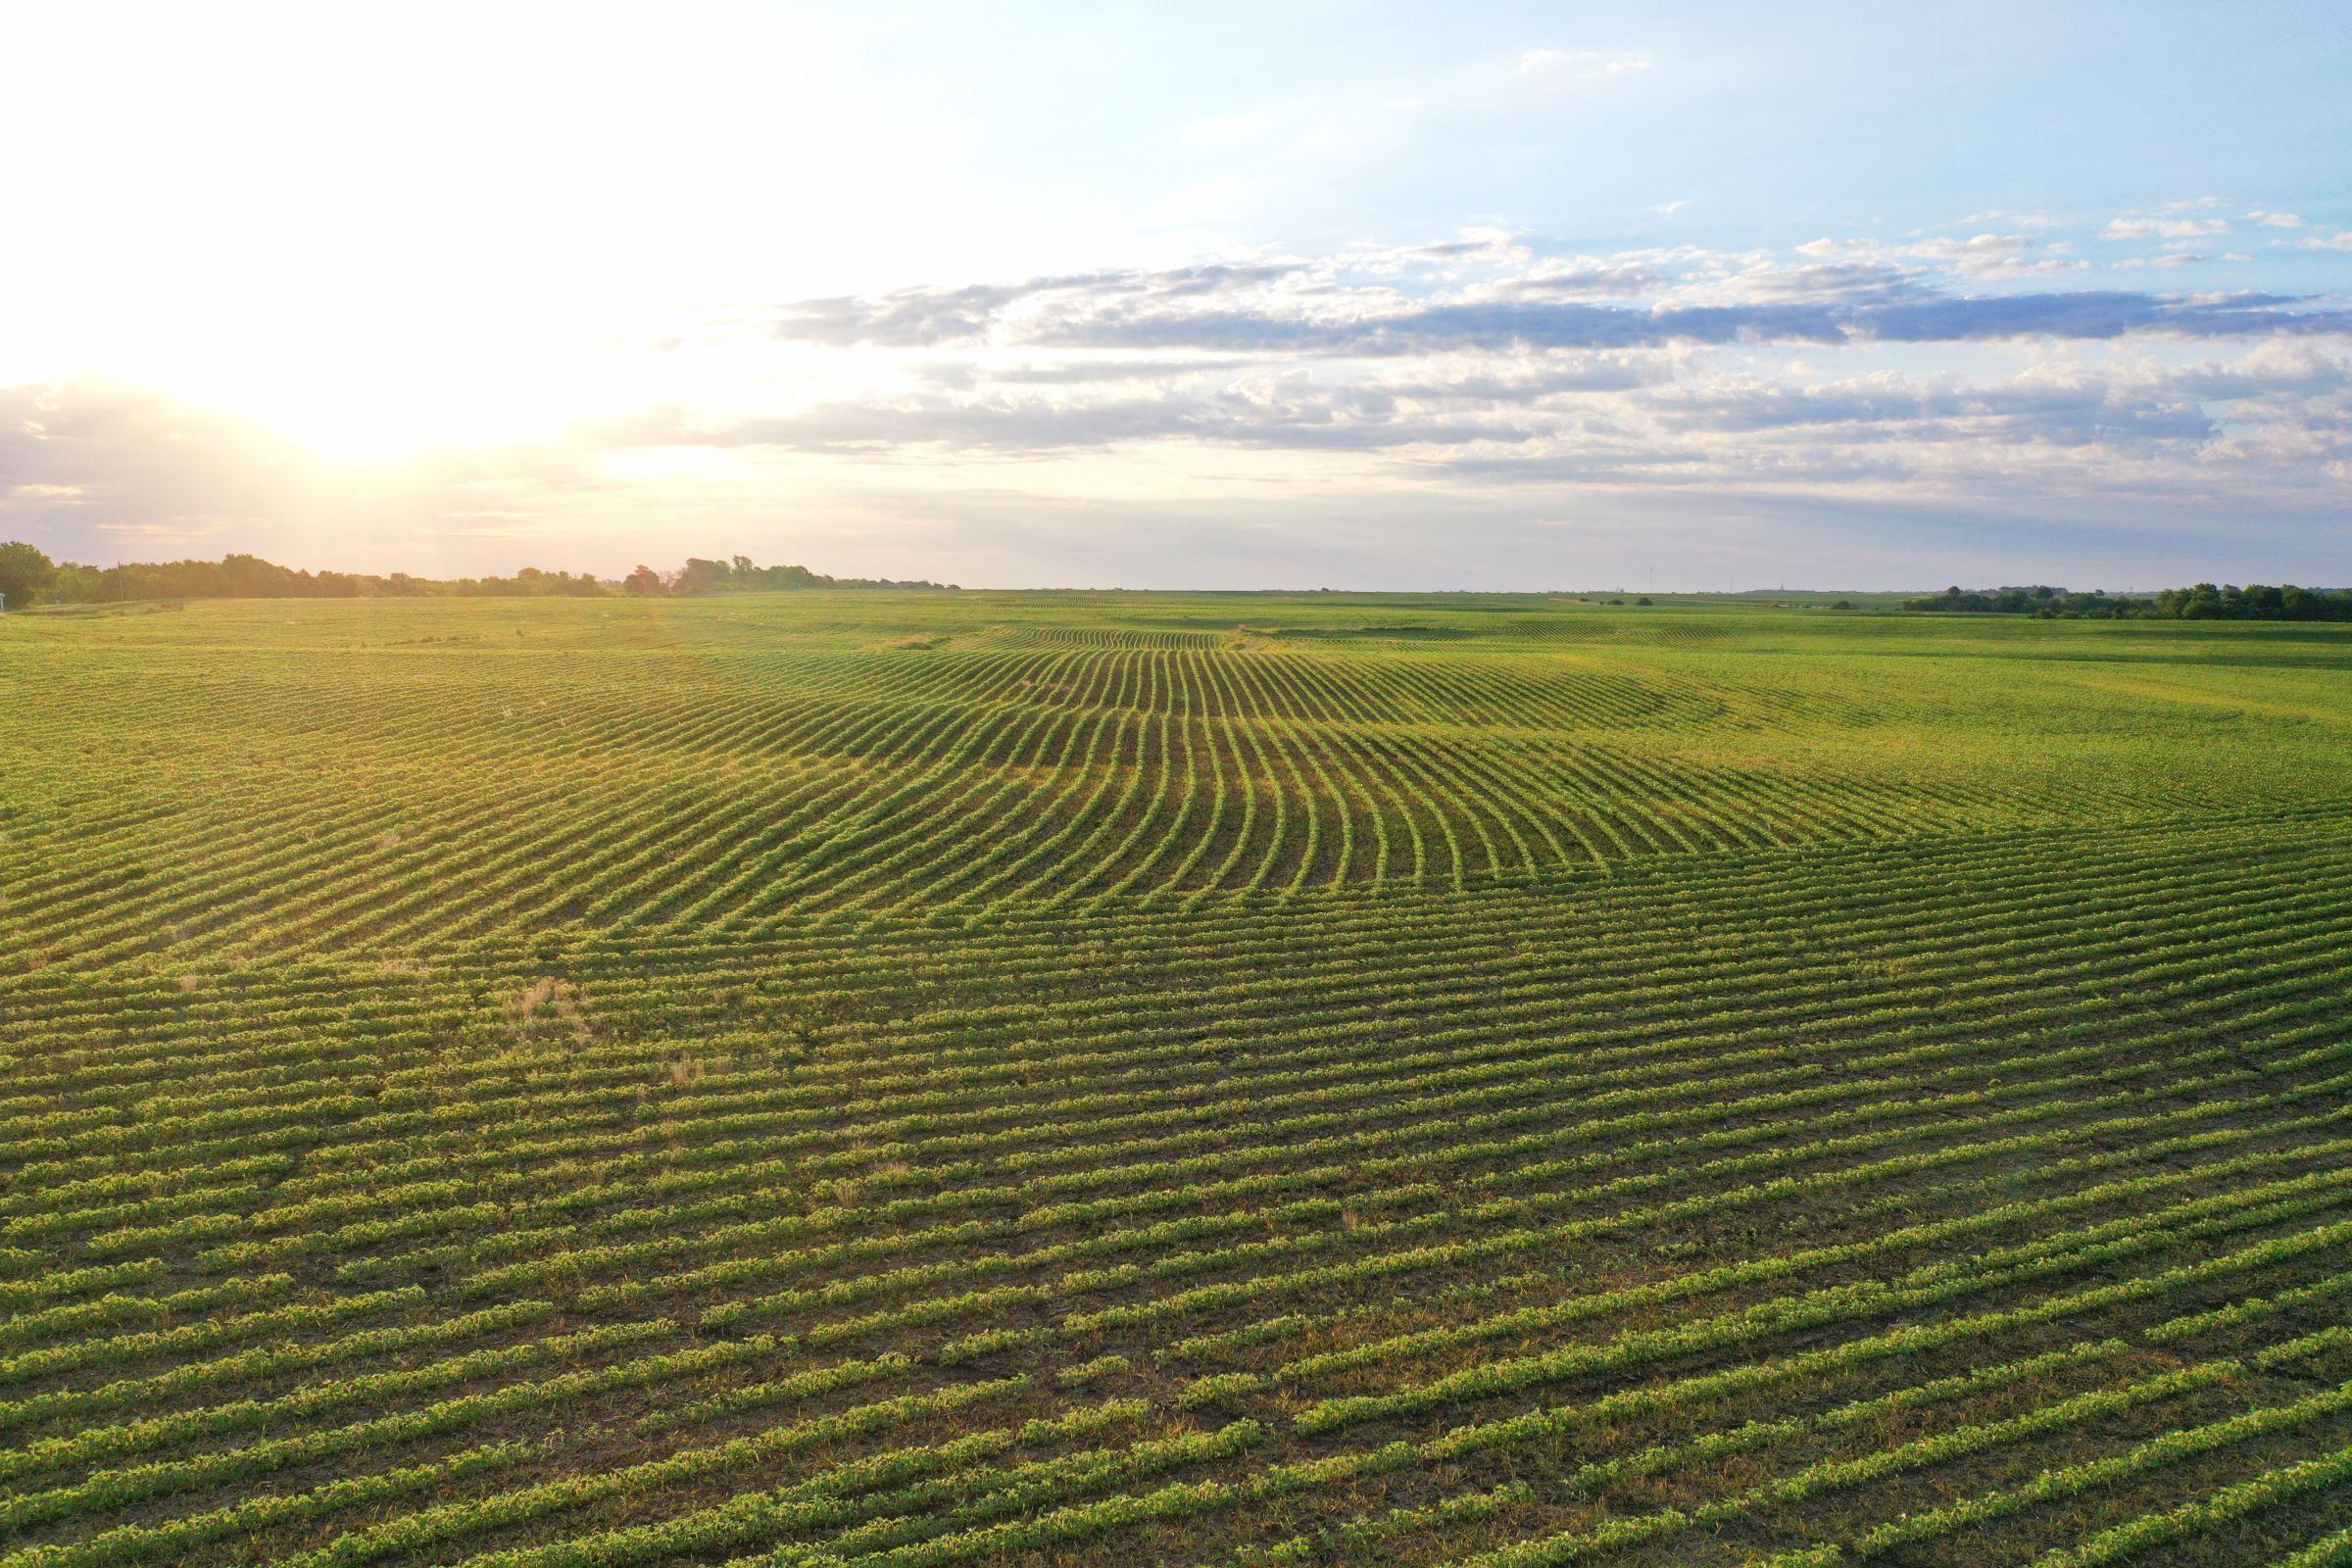 land-clarke-county-iowa-883-acres-listing-number-15596-10-2021-06-23-163324.jpg